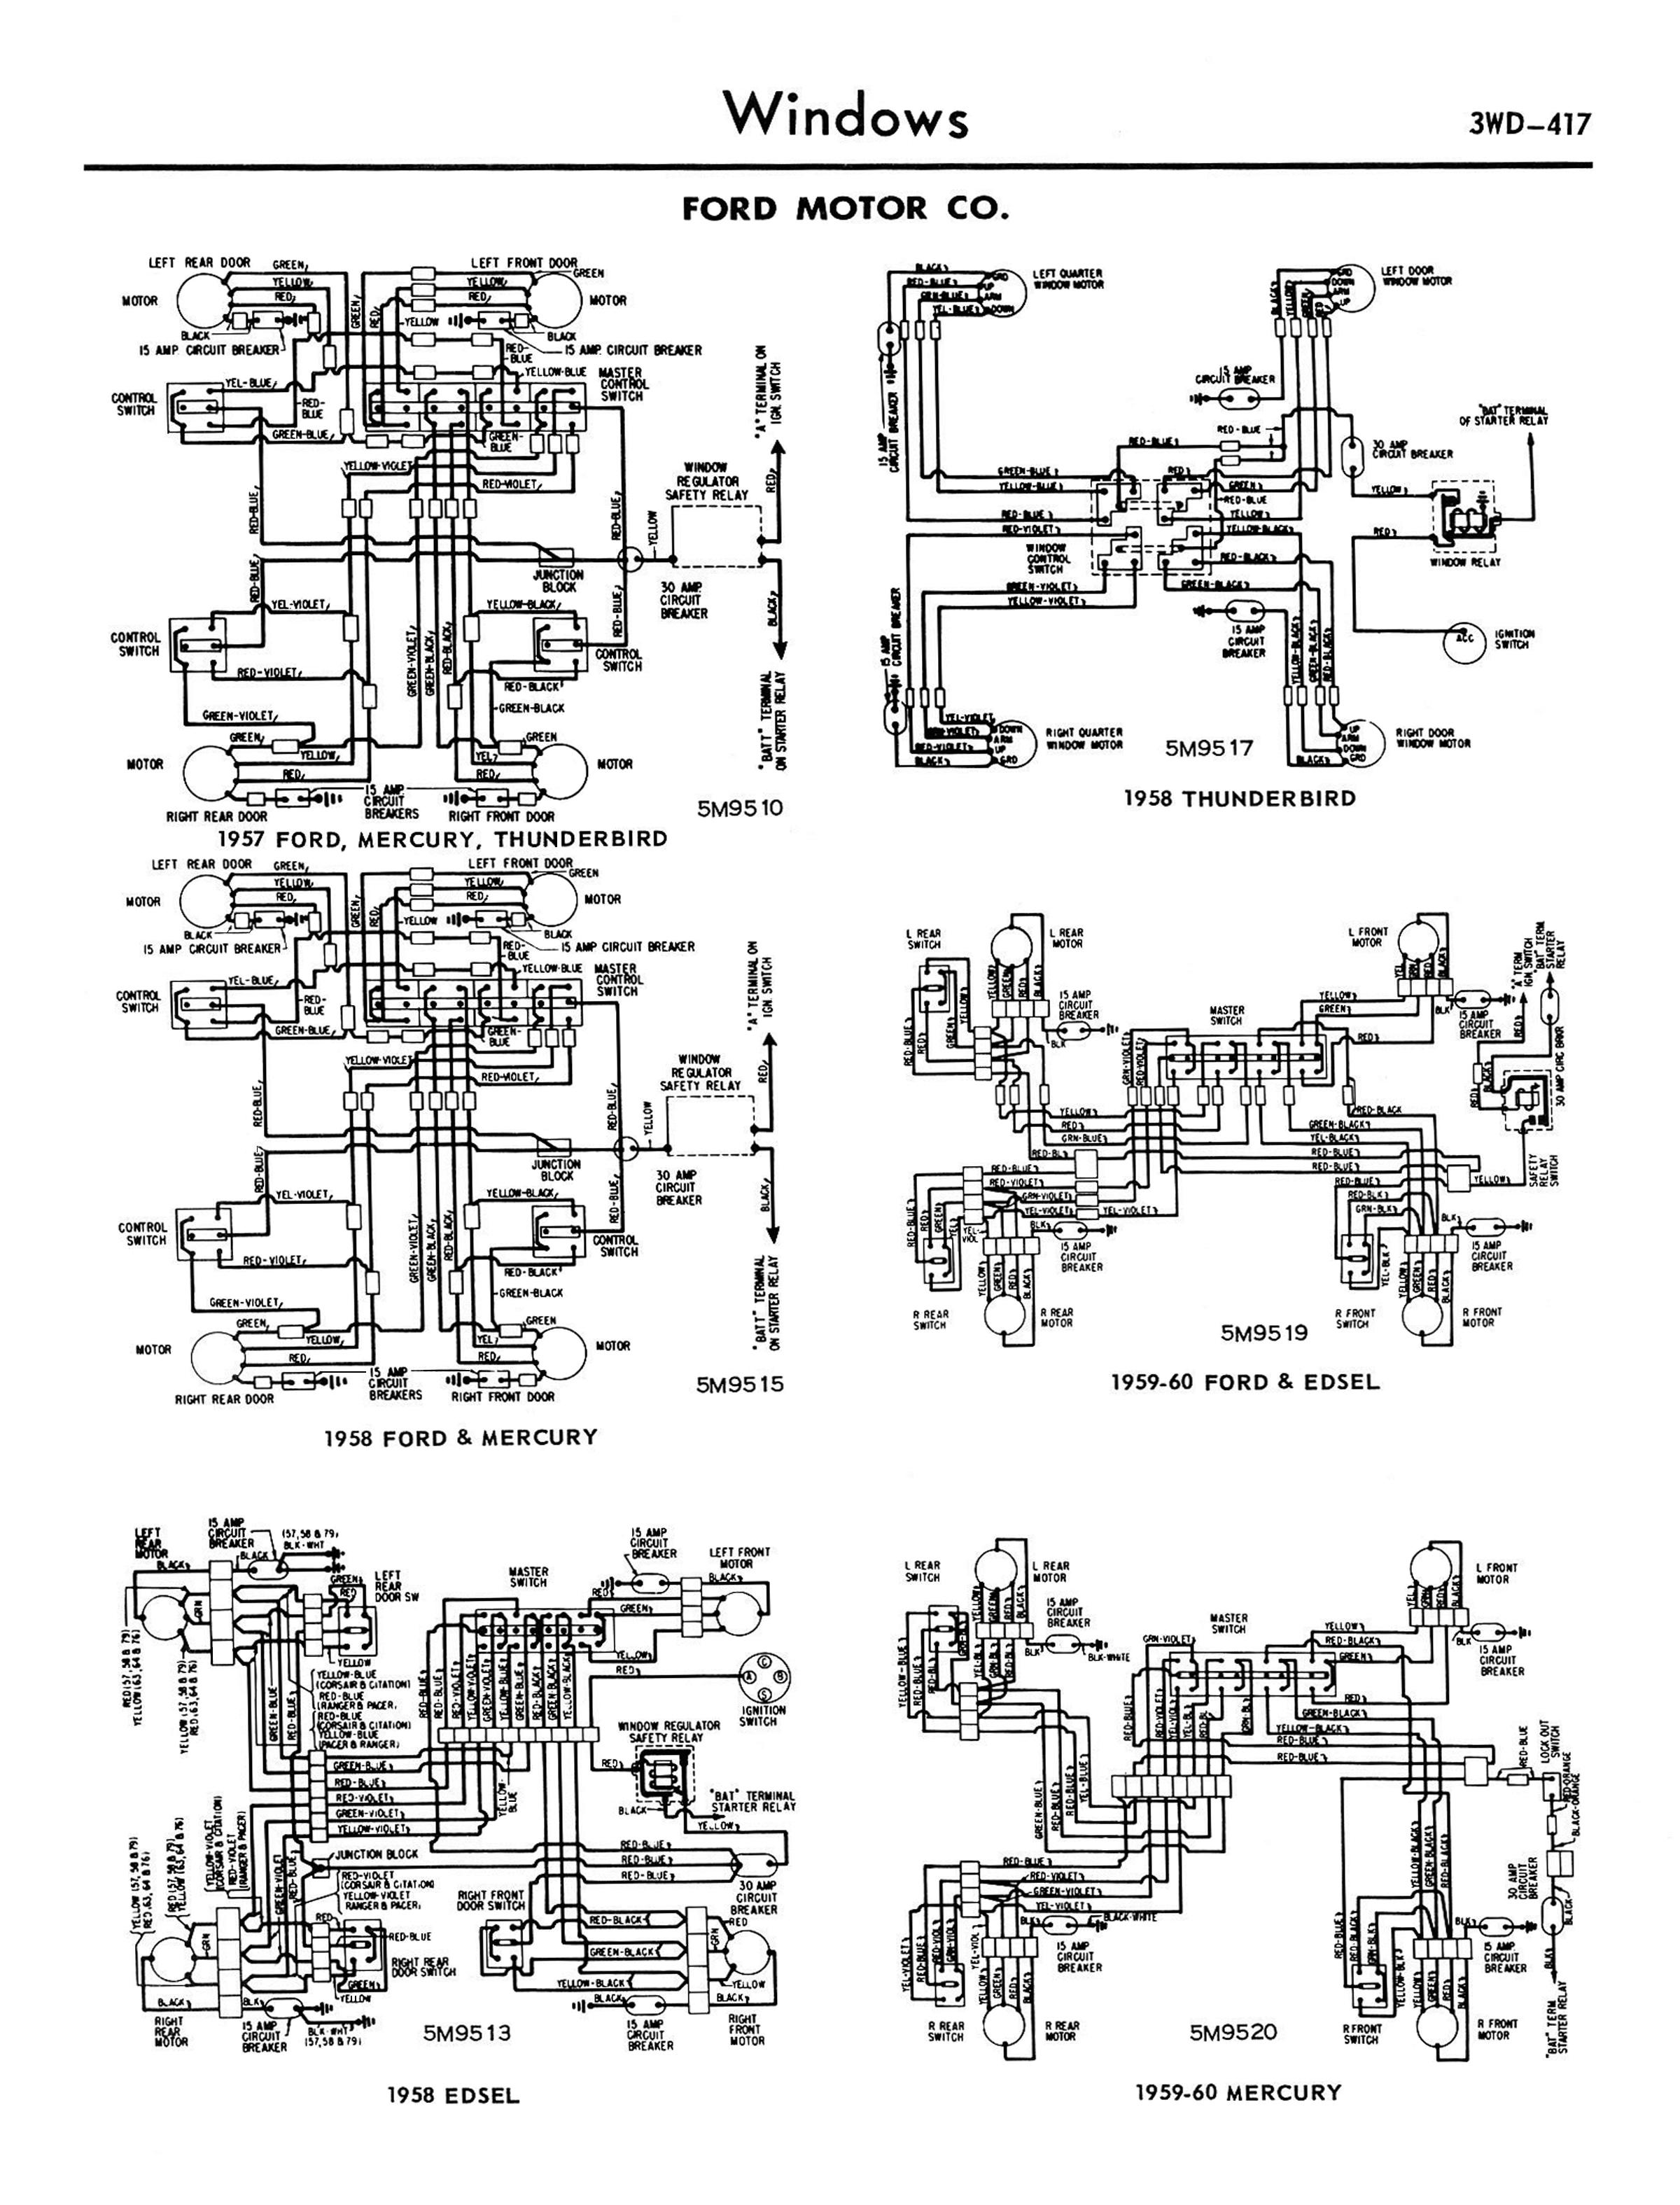 chrysler wiring diagrams schematics swollen glands in neck diagram 68 new yorker imageresizertool com